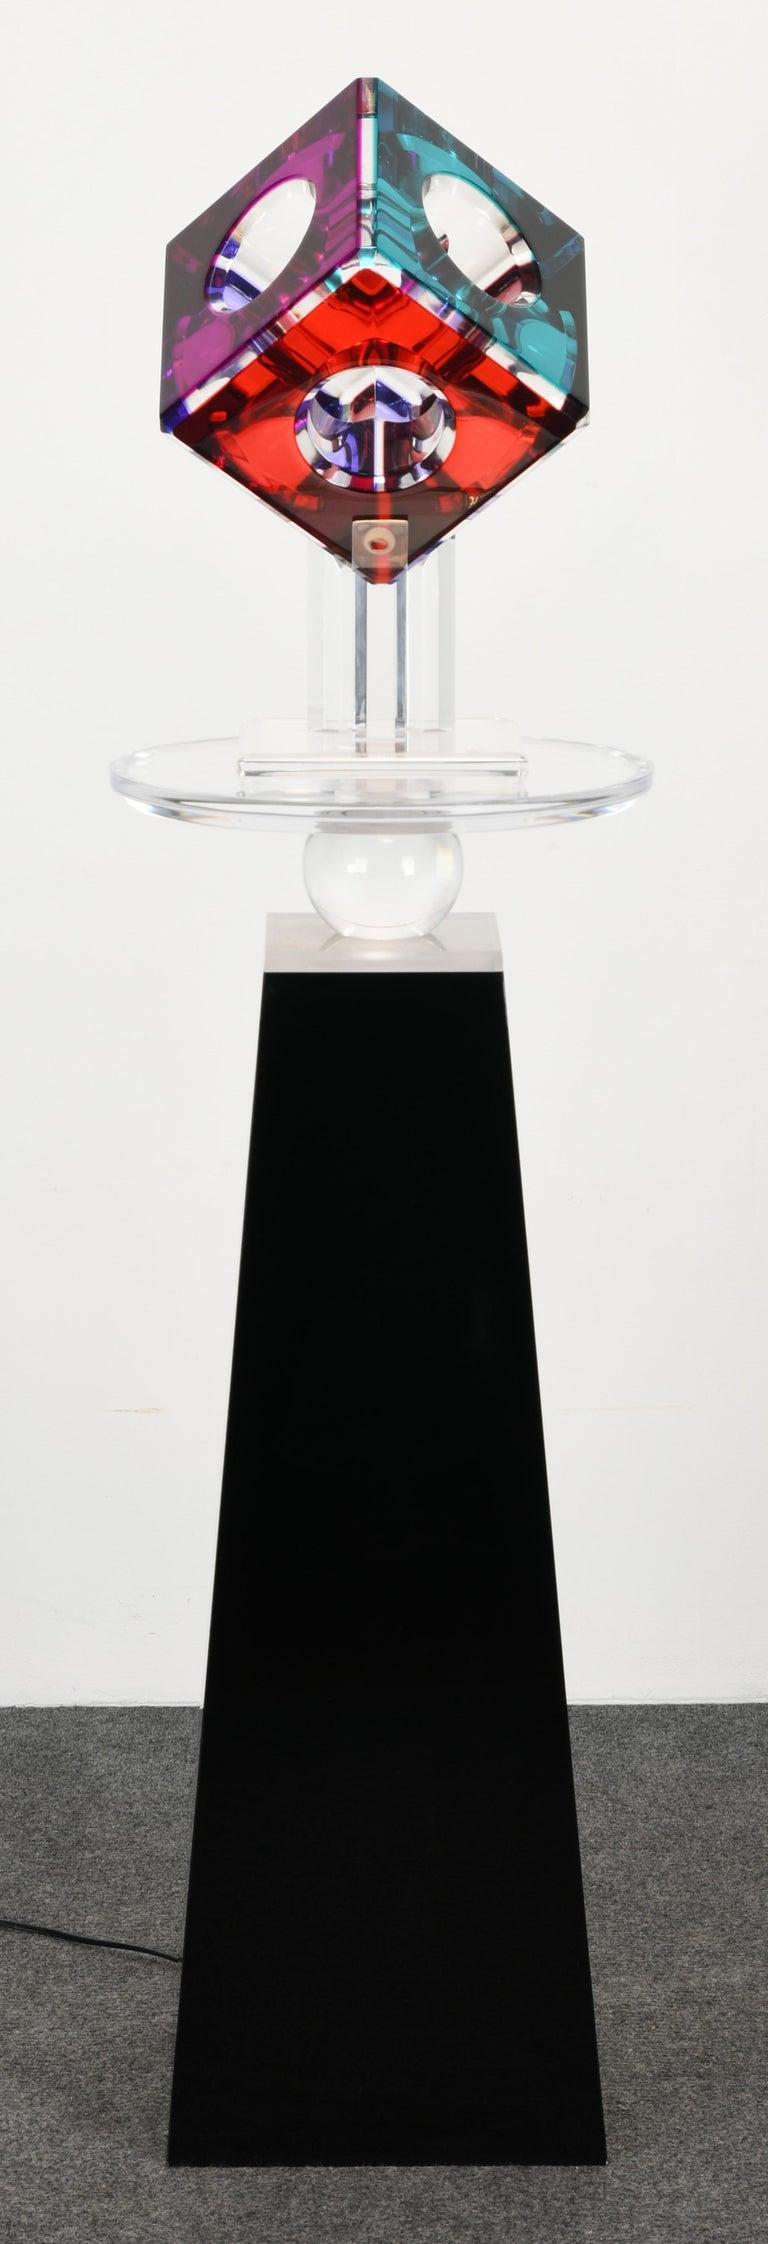 Lucite Sculpture by Shlomi Haziza, 2000s 8